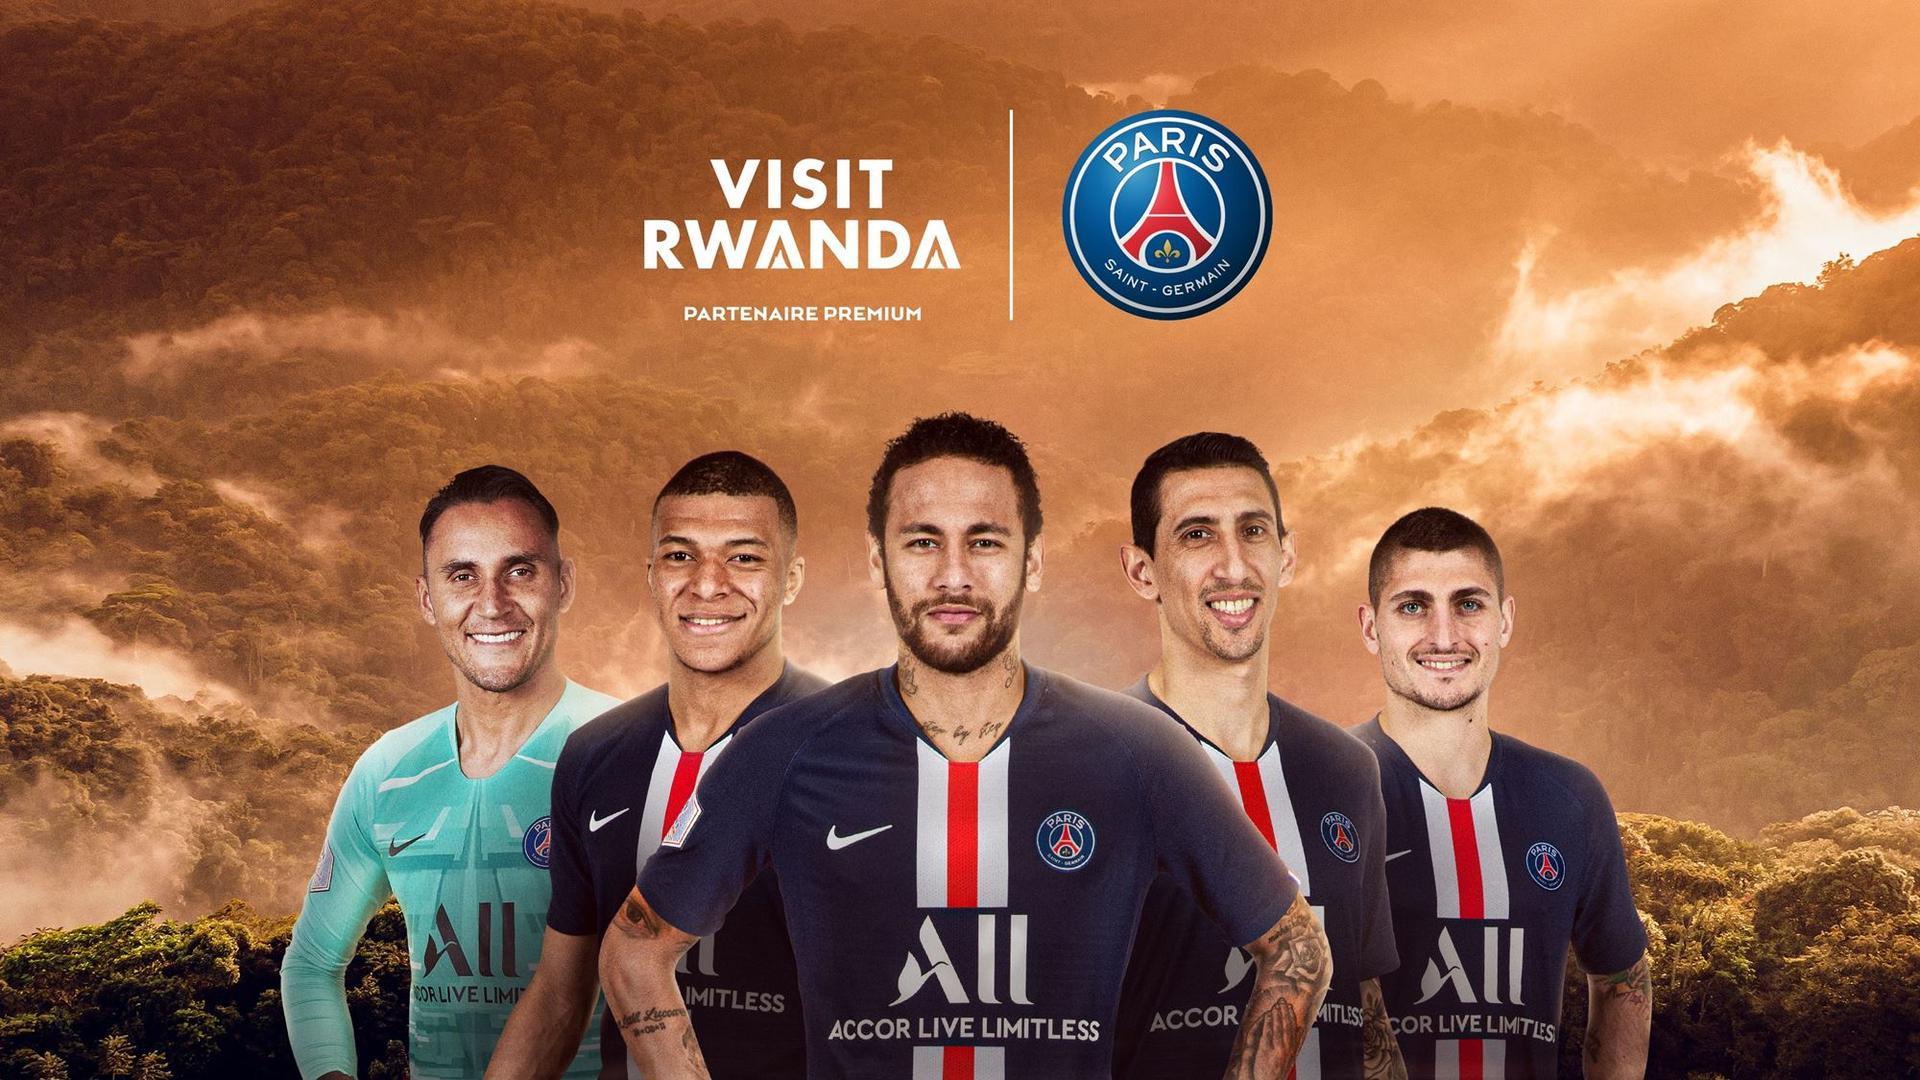 رواندا توقع اتفاقا مع نادي باريس سان جيرمان للترويج لسياحتها